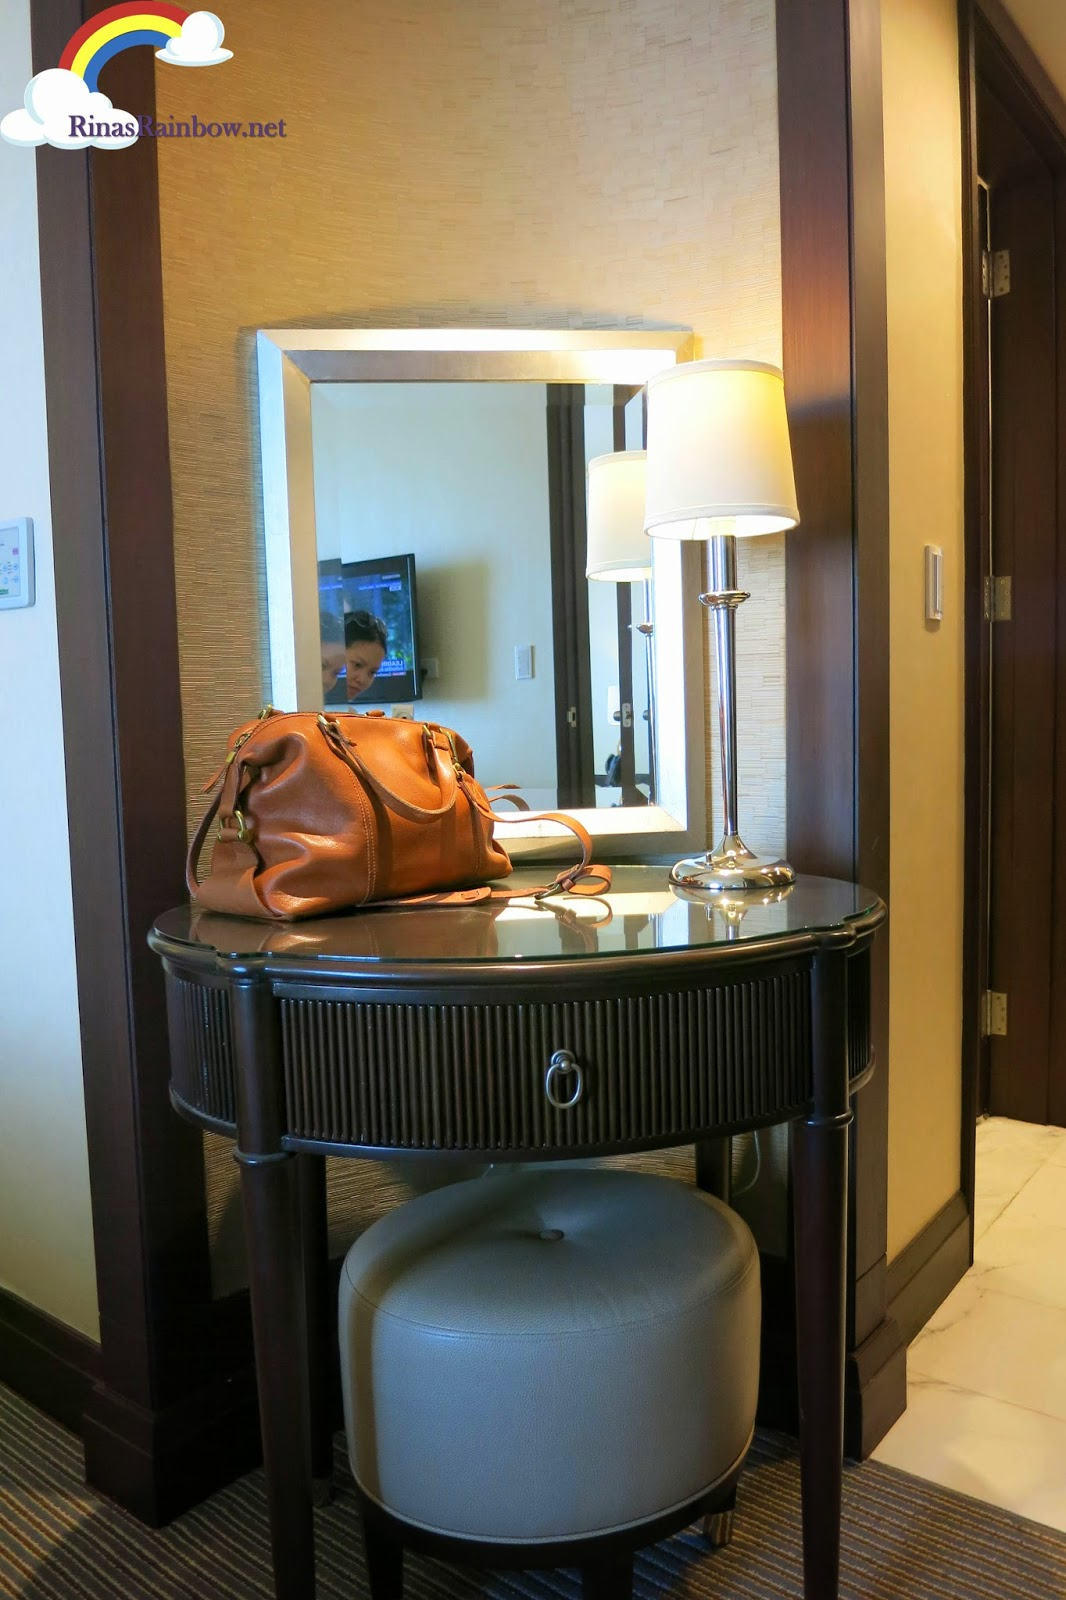 classy hotel dresser